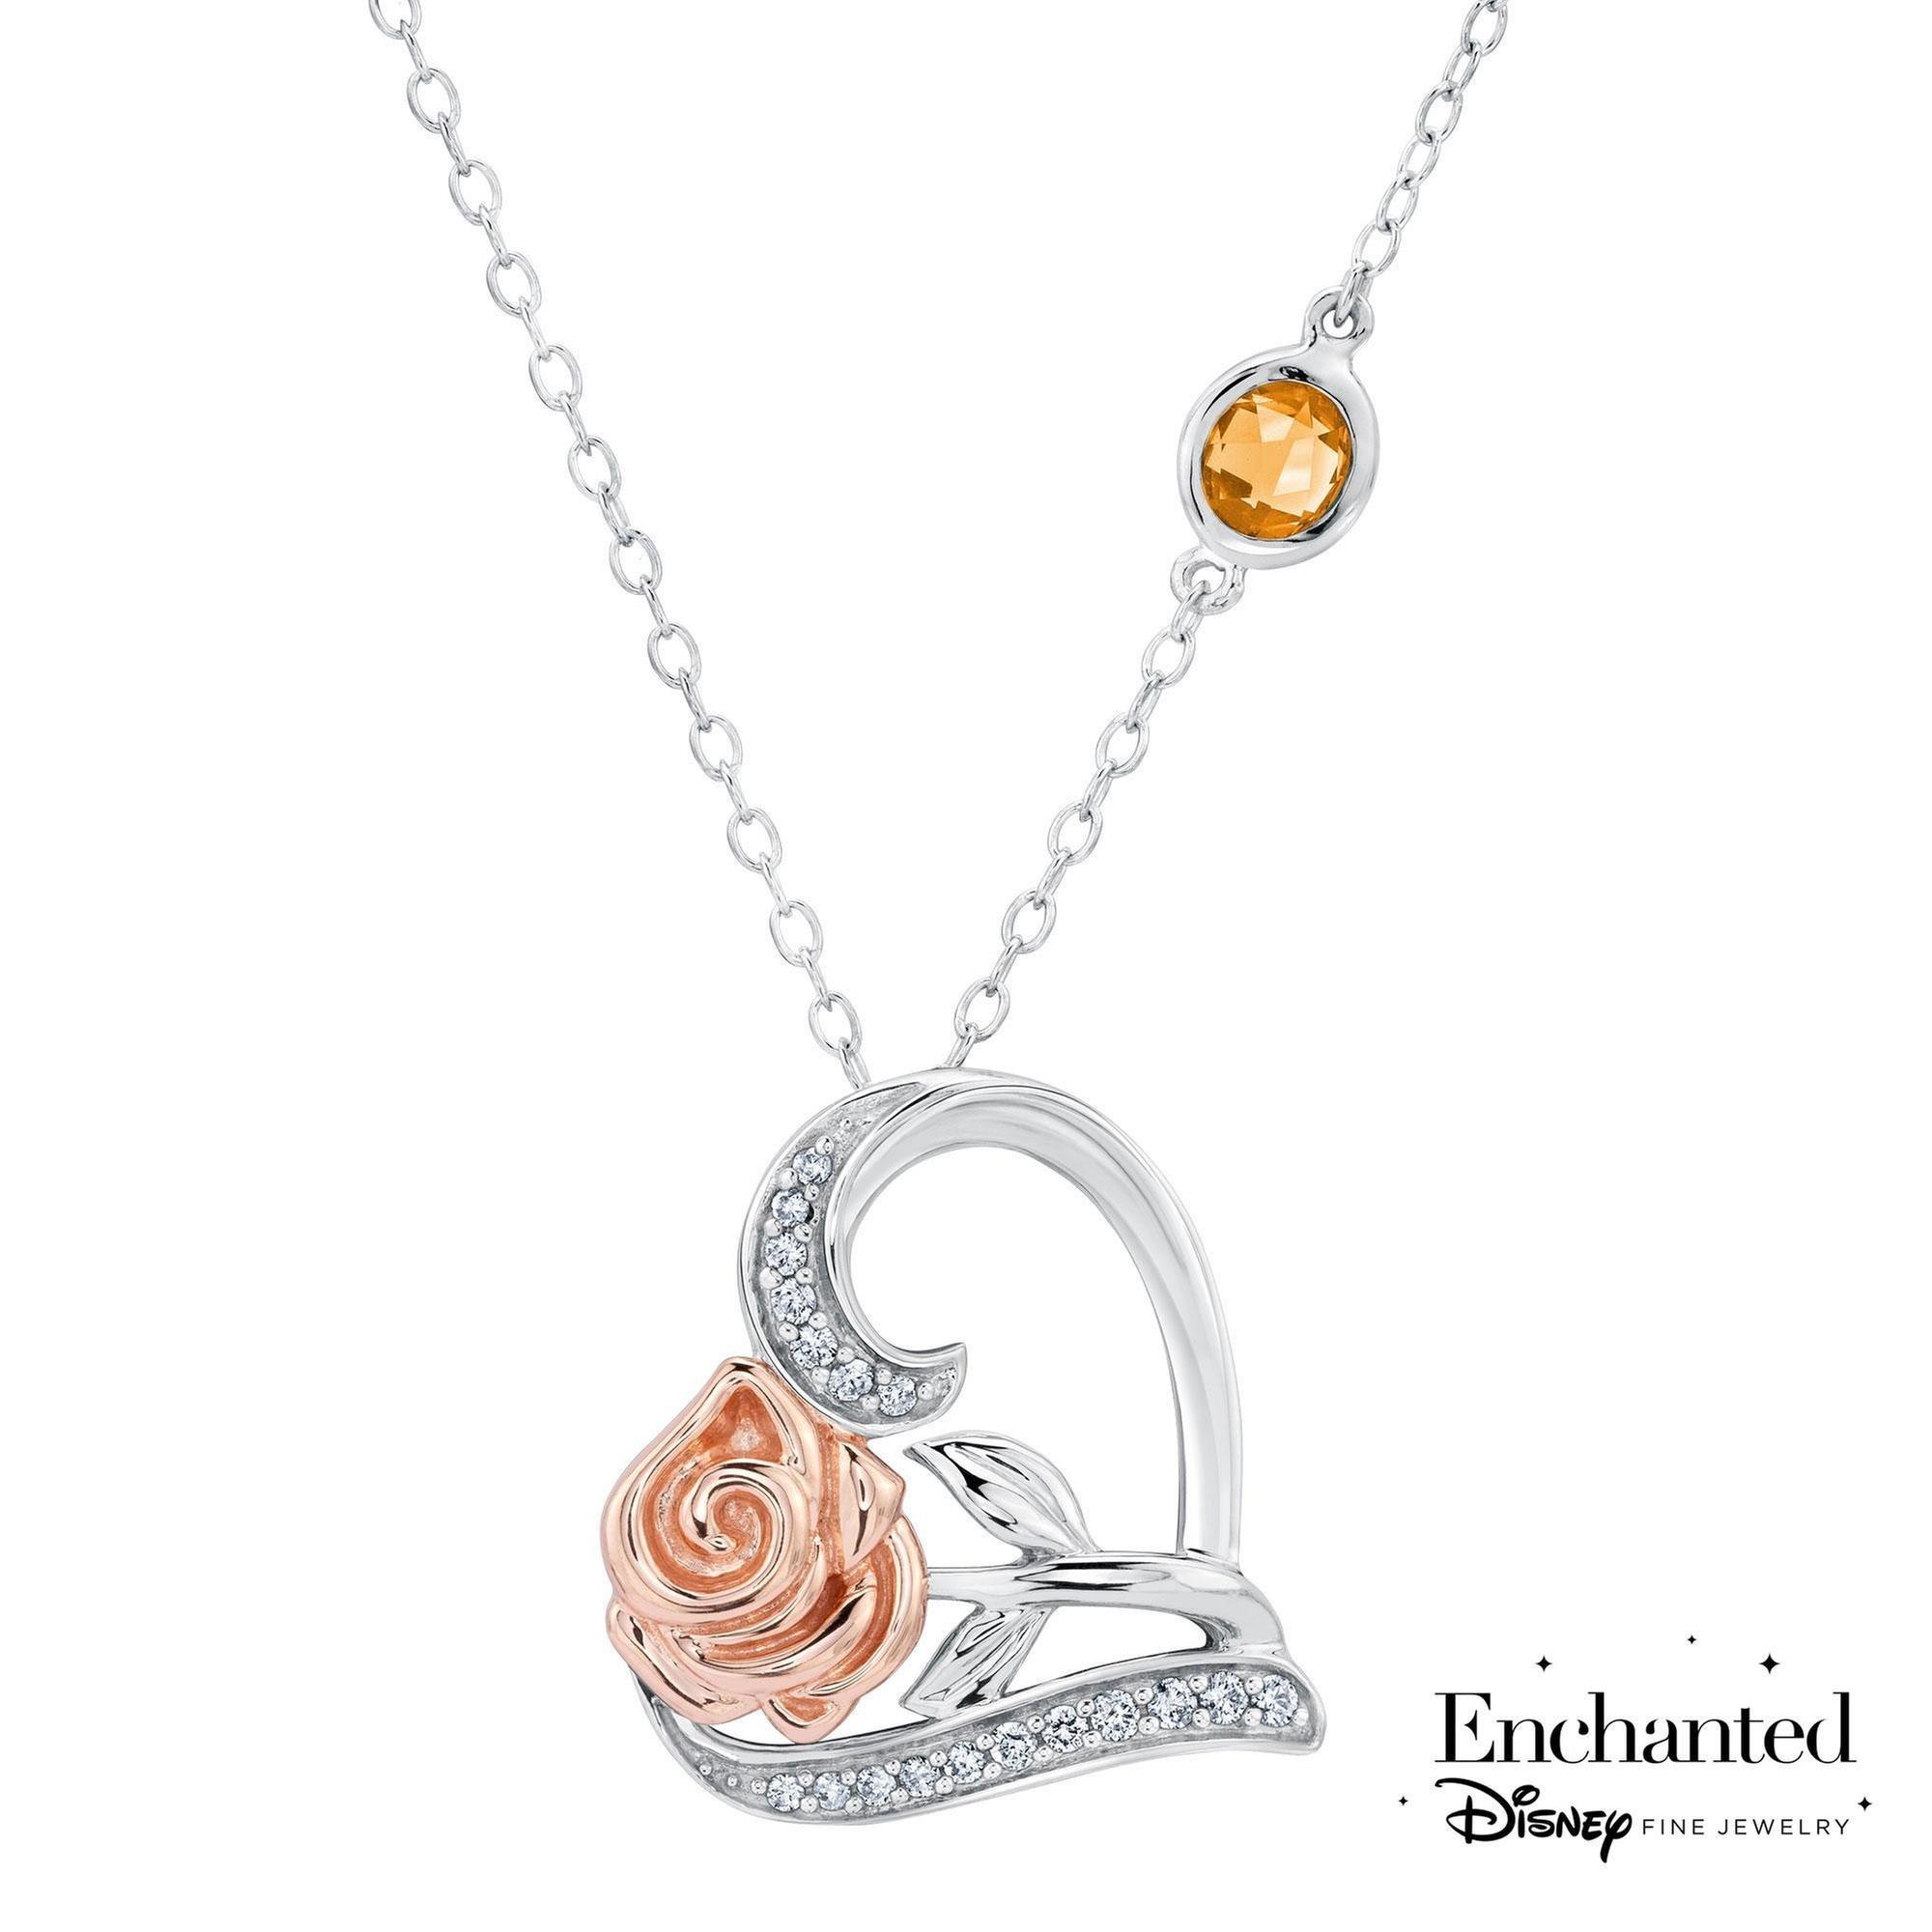 Enchanted Disney Belle's Rose and Heart Diamond Pendant 1/10ctw